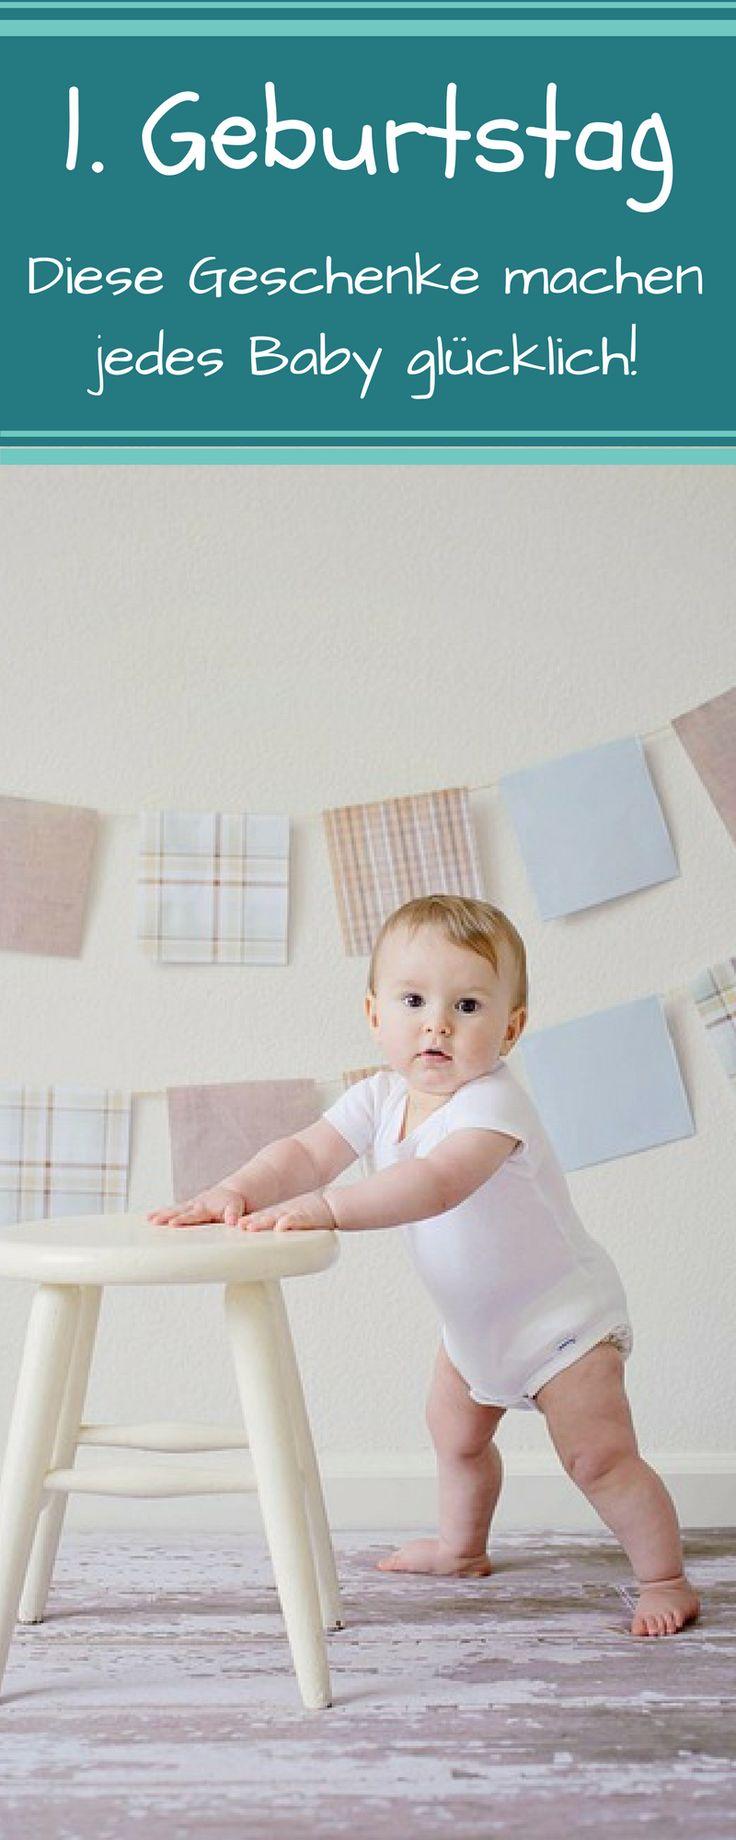 38 best 1. Geburtstag images on Pinterest | Baby geburtstag, Baby ...